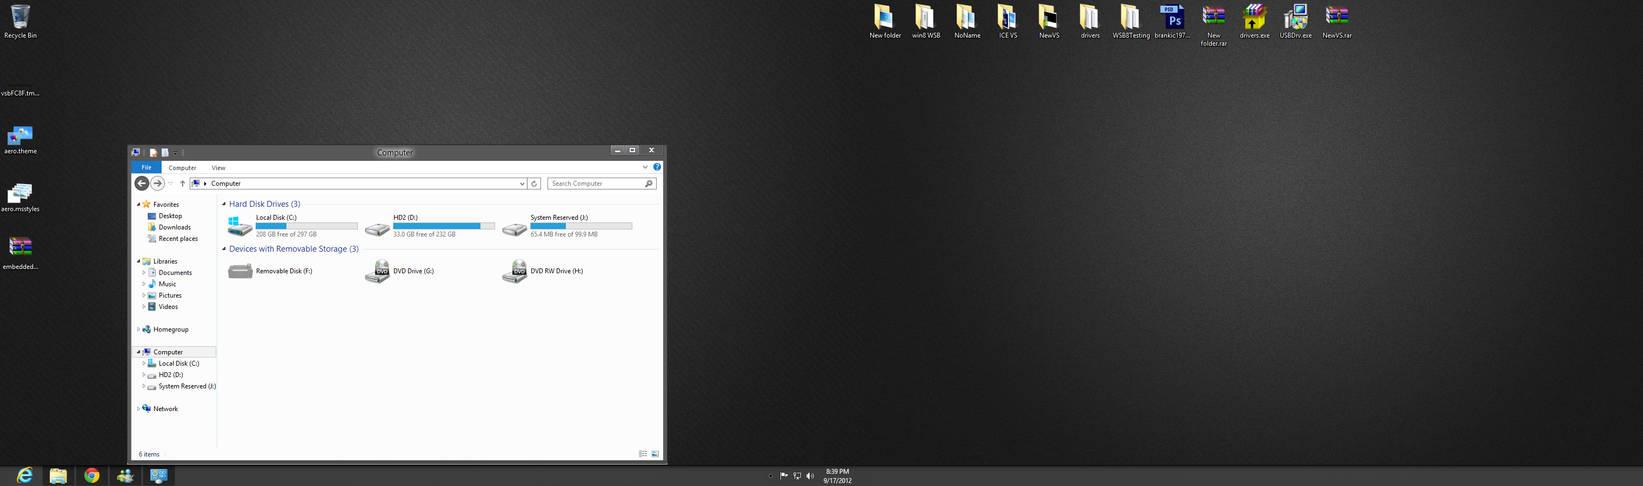 Embedded for Windows 8 RTM